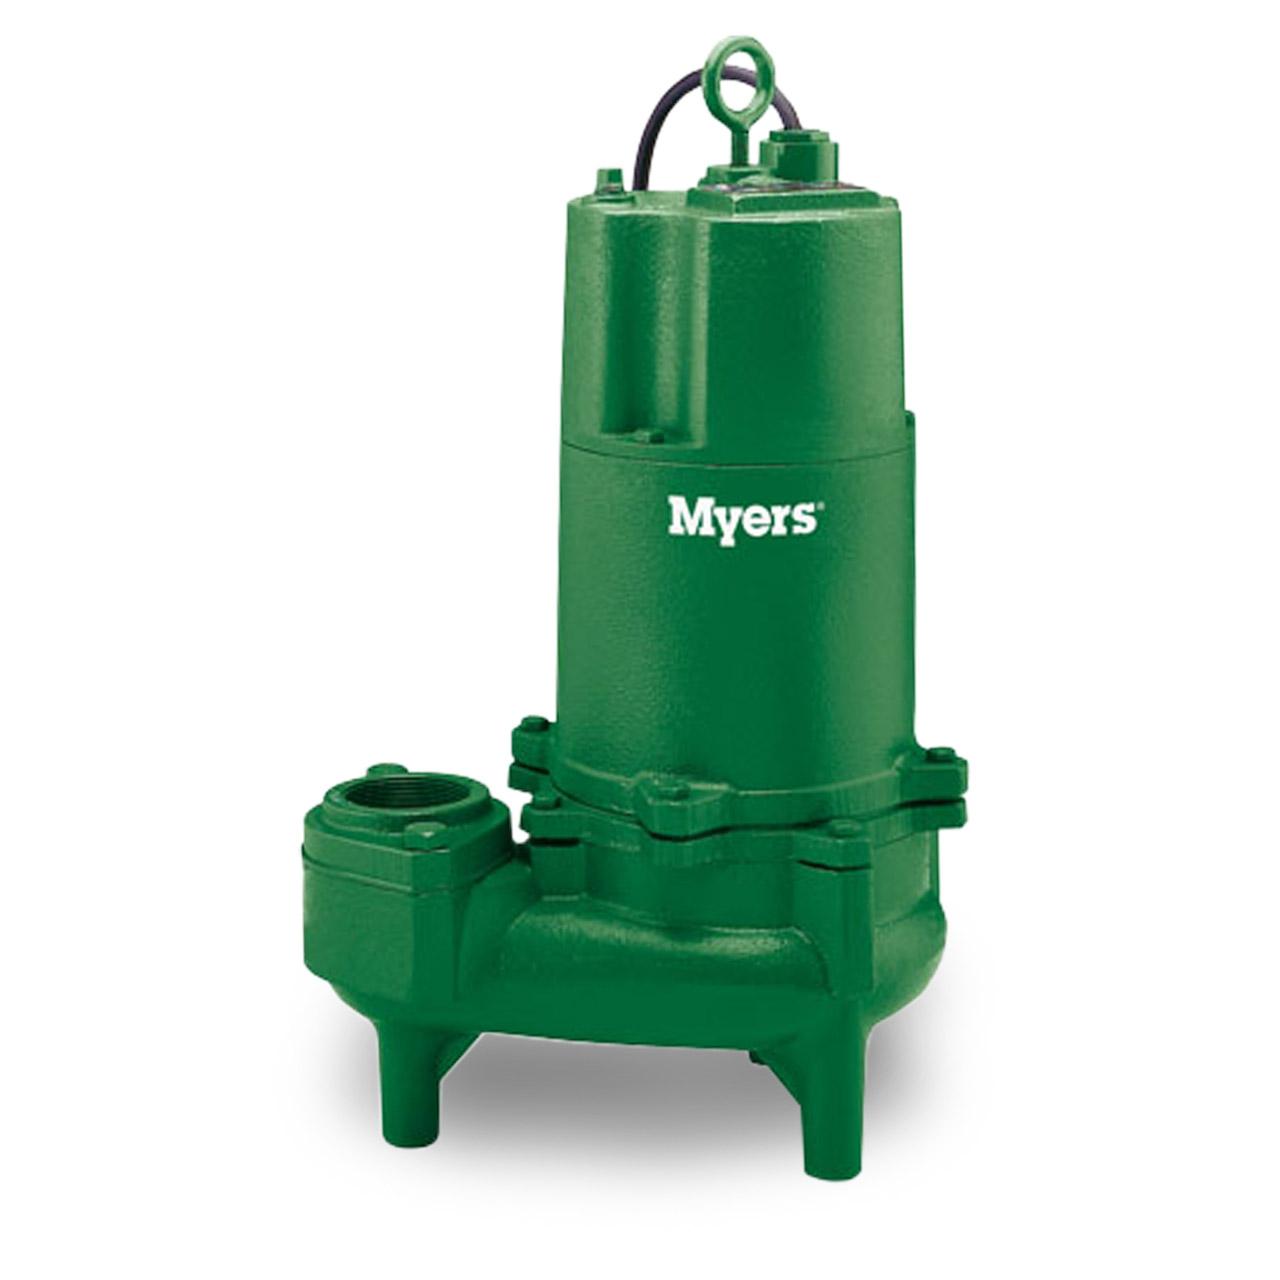 meyer plow pump 2001 dodge ram 1500 alternator wiring diagram e47 parts